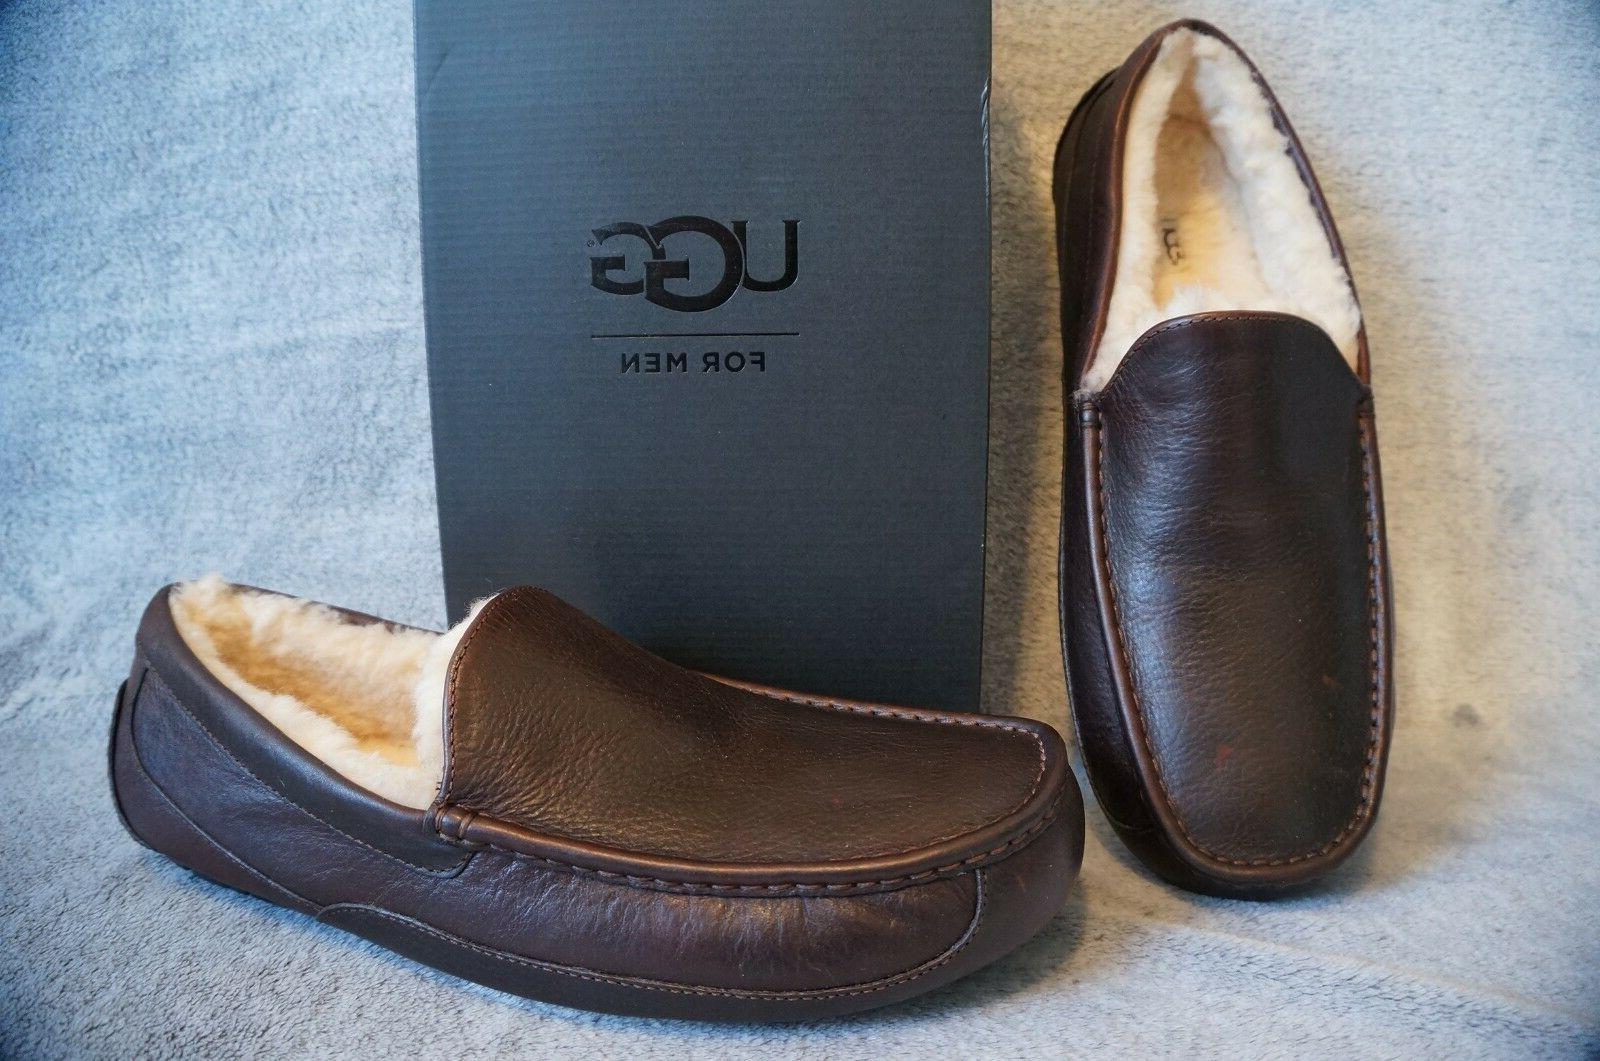 ascot leather grain slippers us 10 eee